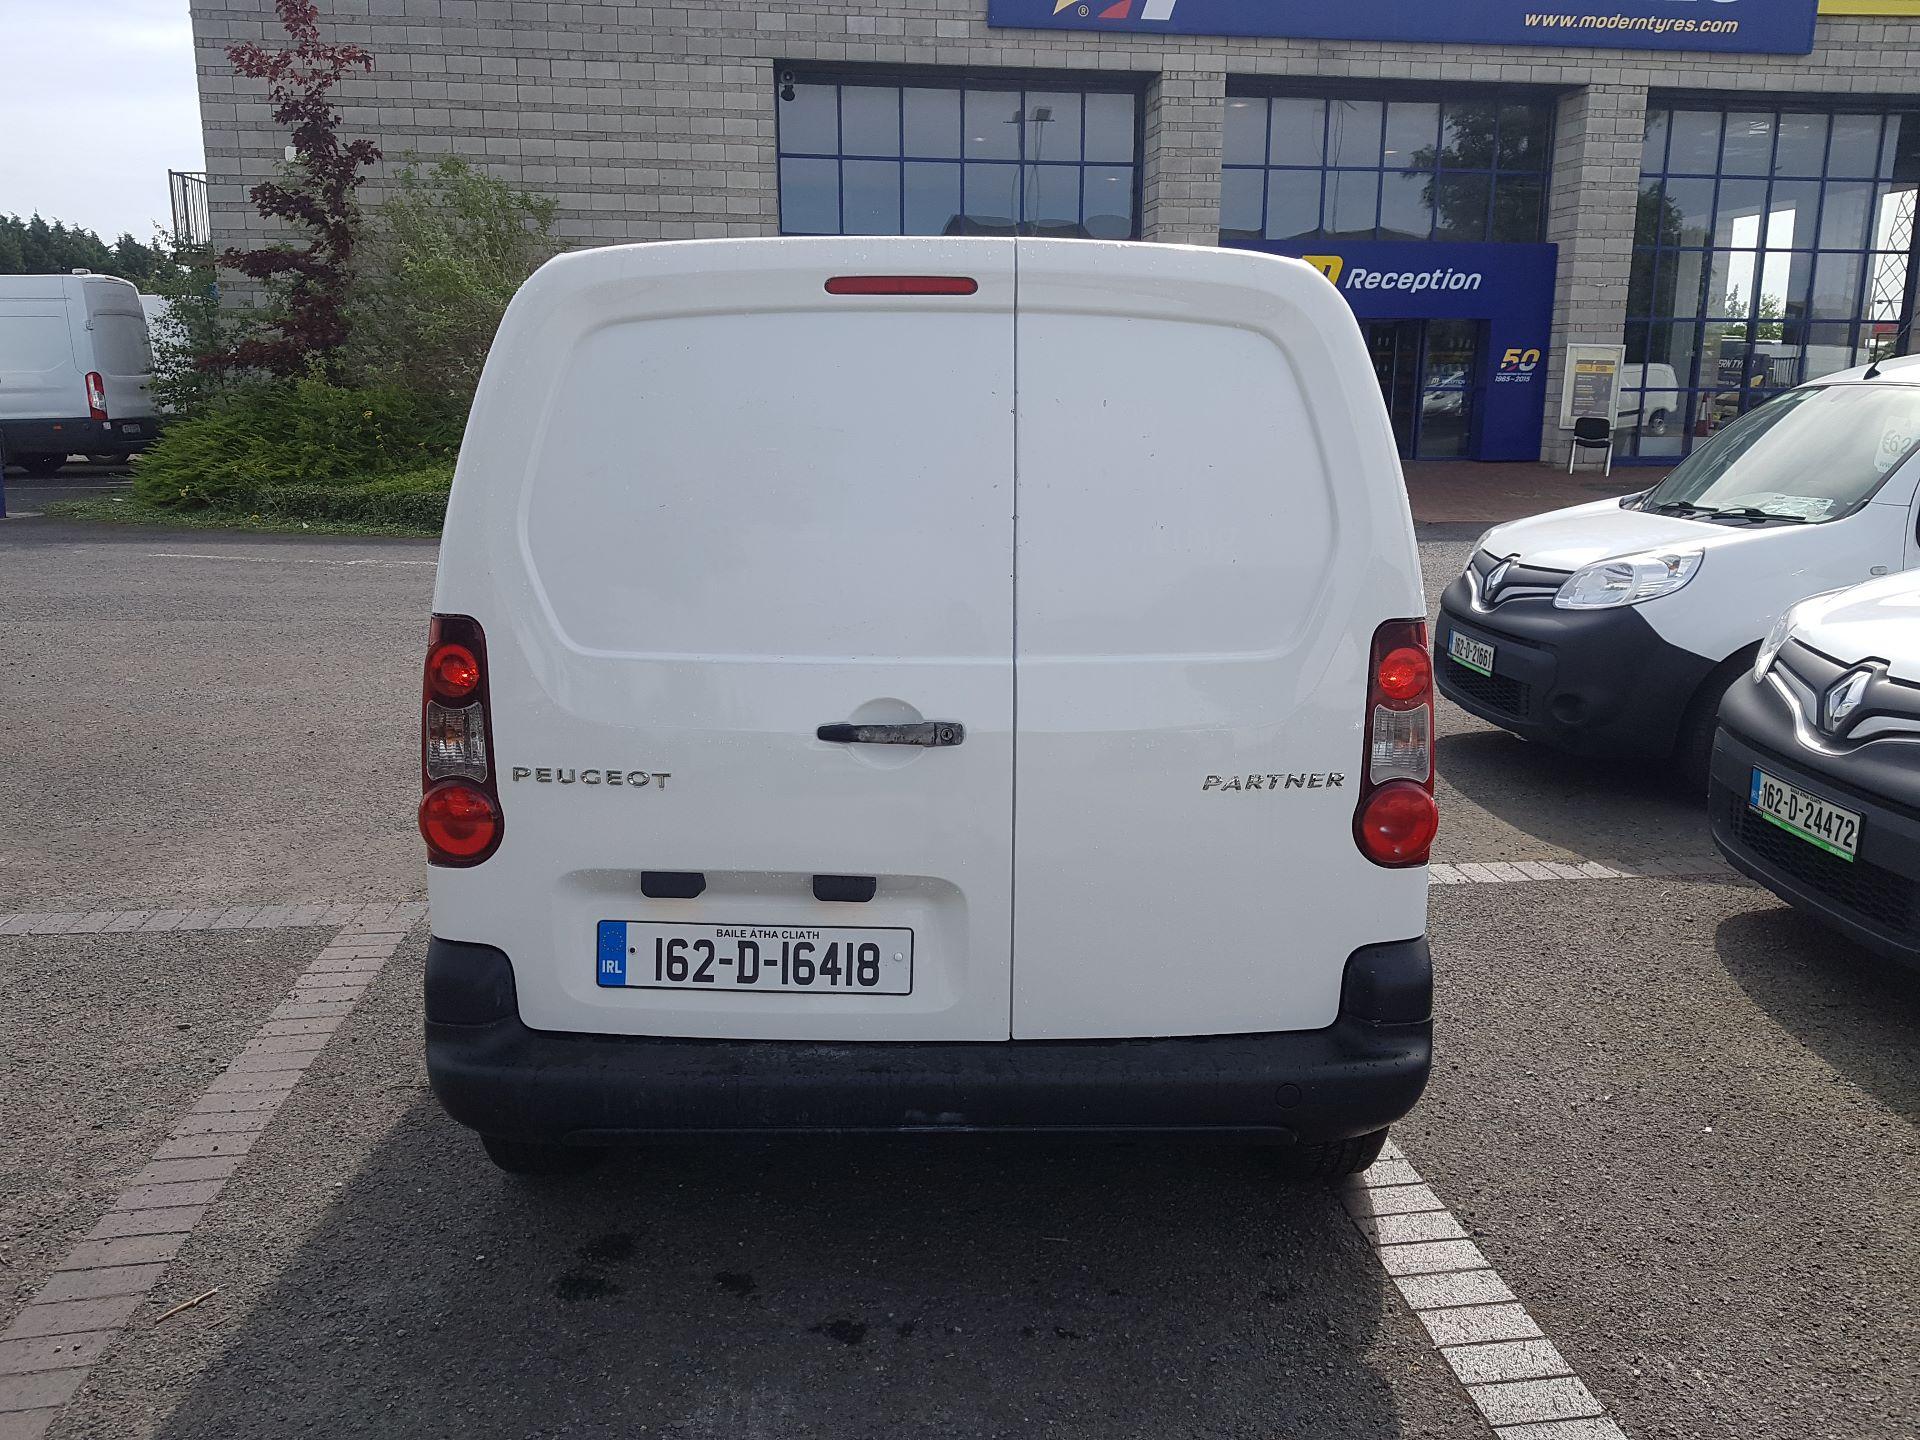 2016 Peugeot Partner Access 1.6 HDI 92 3DR (162D16418) Image 4